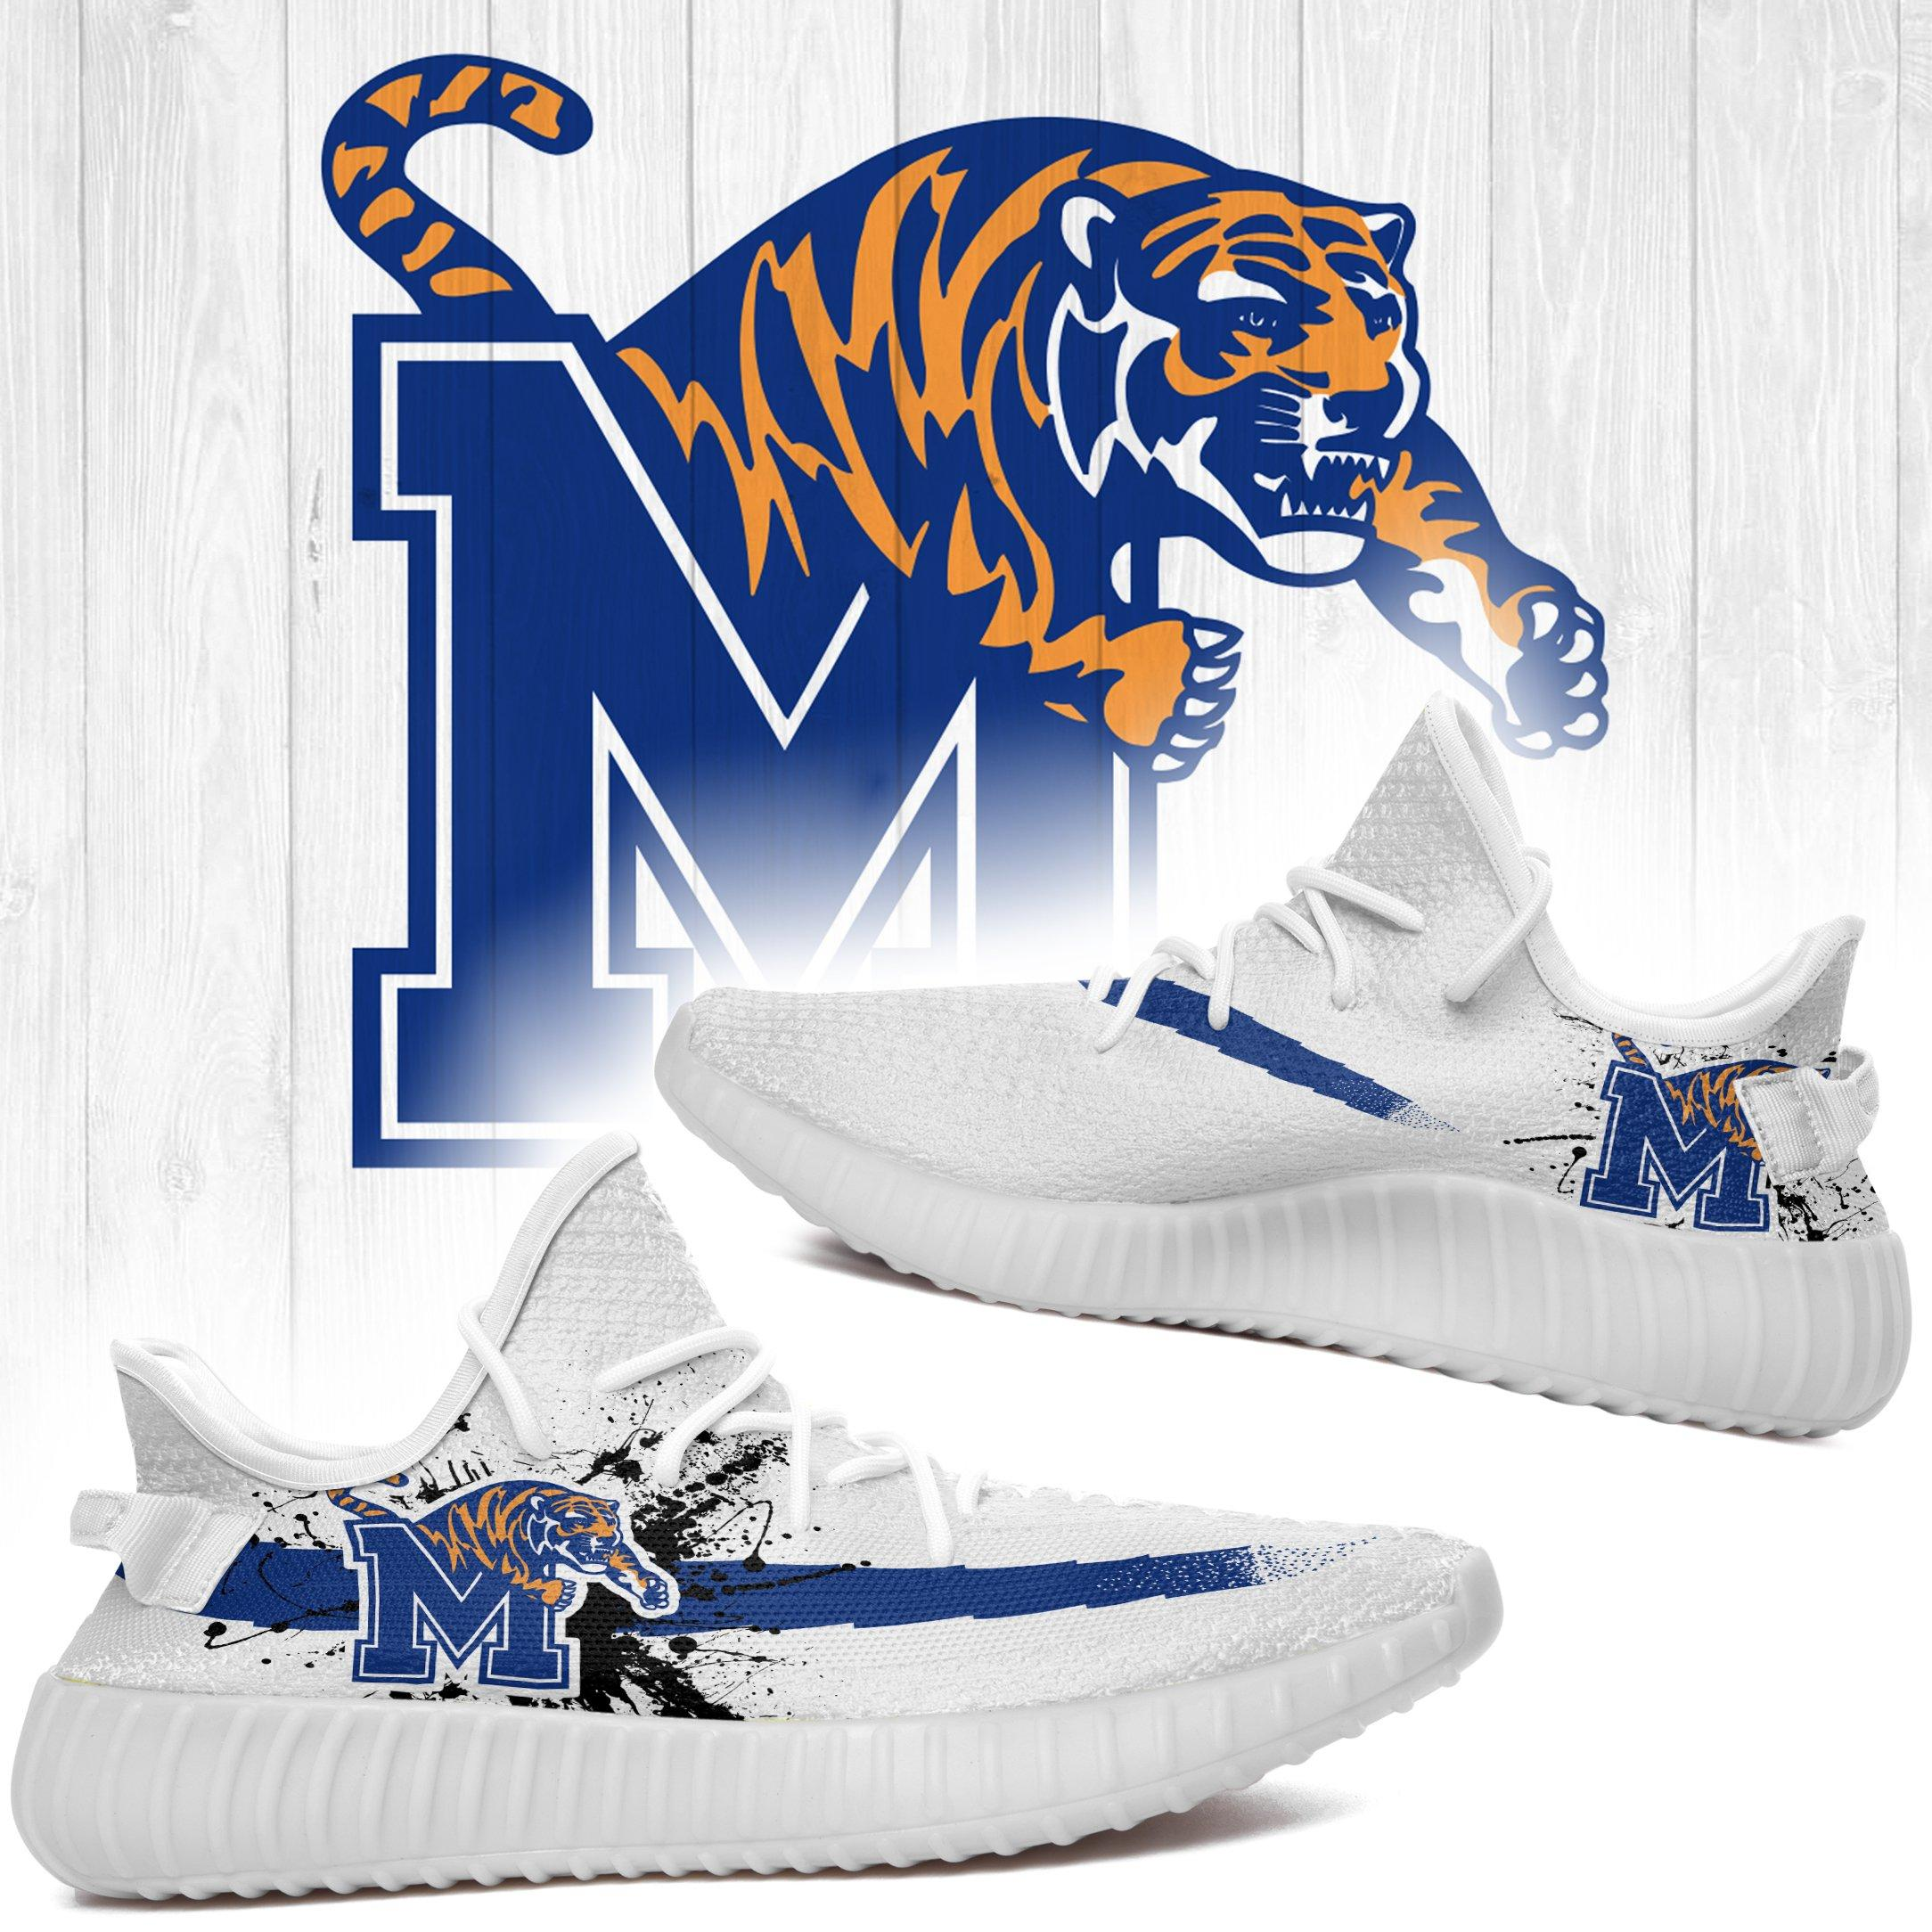 Memphis Tigers Custom Yeezy Shoes NCAA